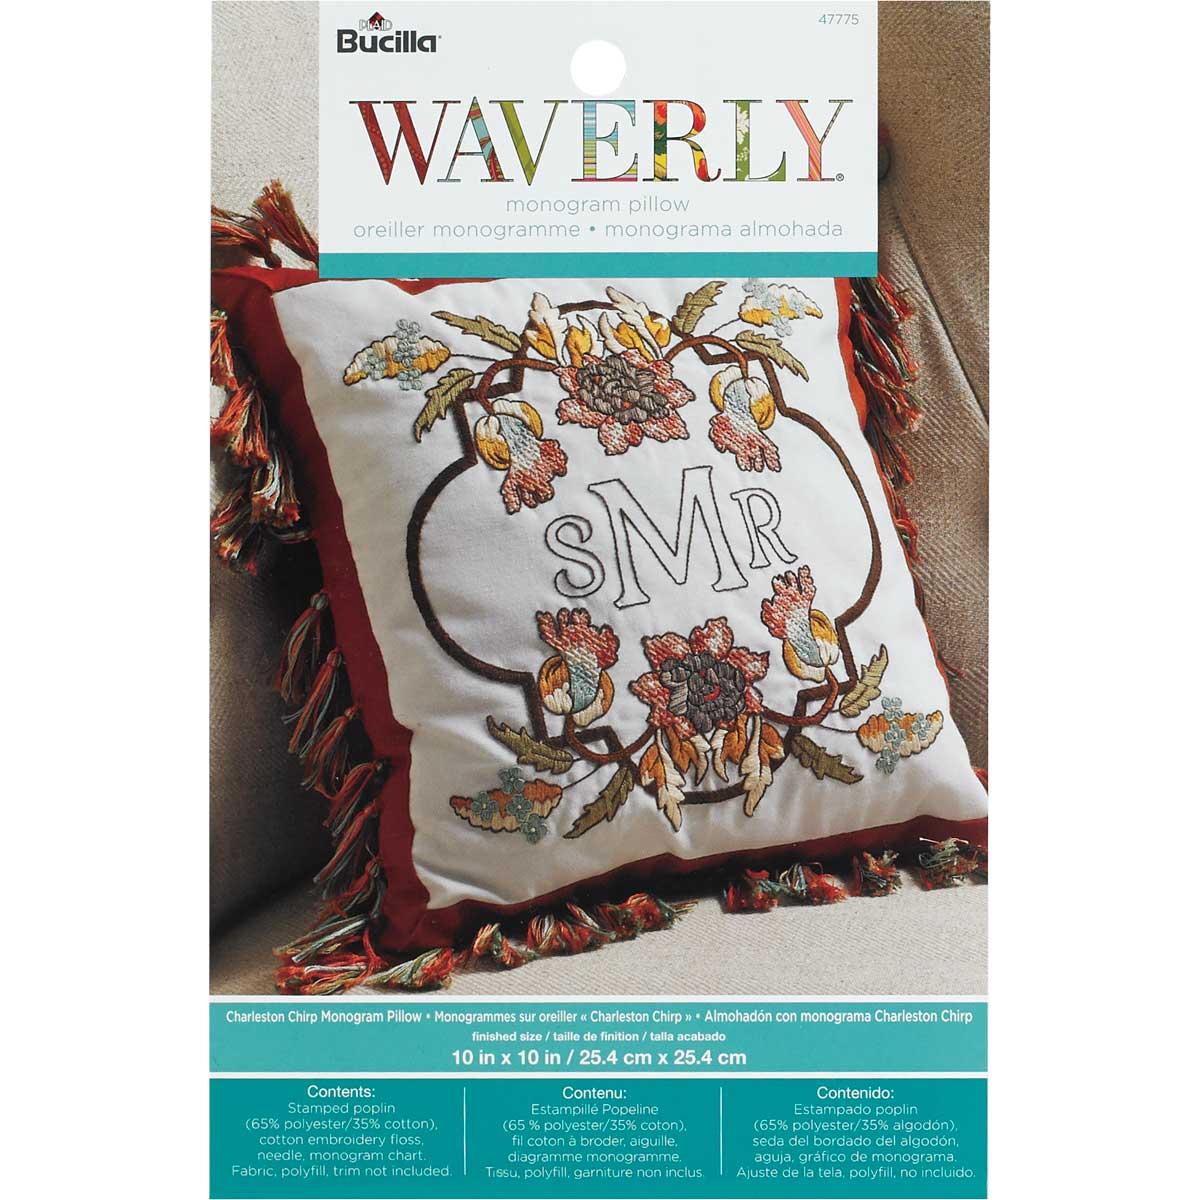 Bucilla Waverly Charleston Chirp Collection Stamped Pillow